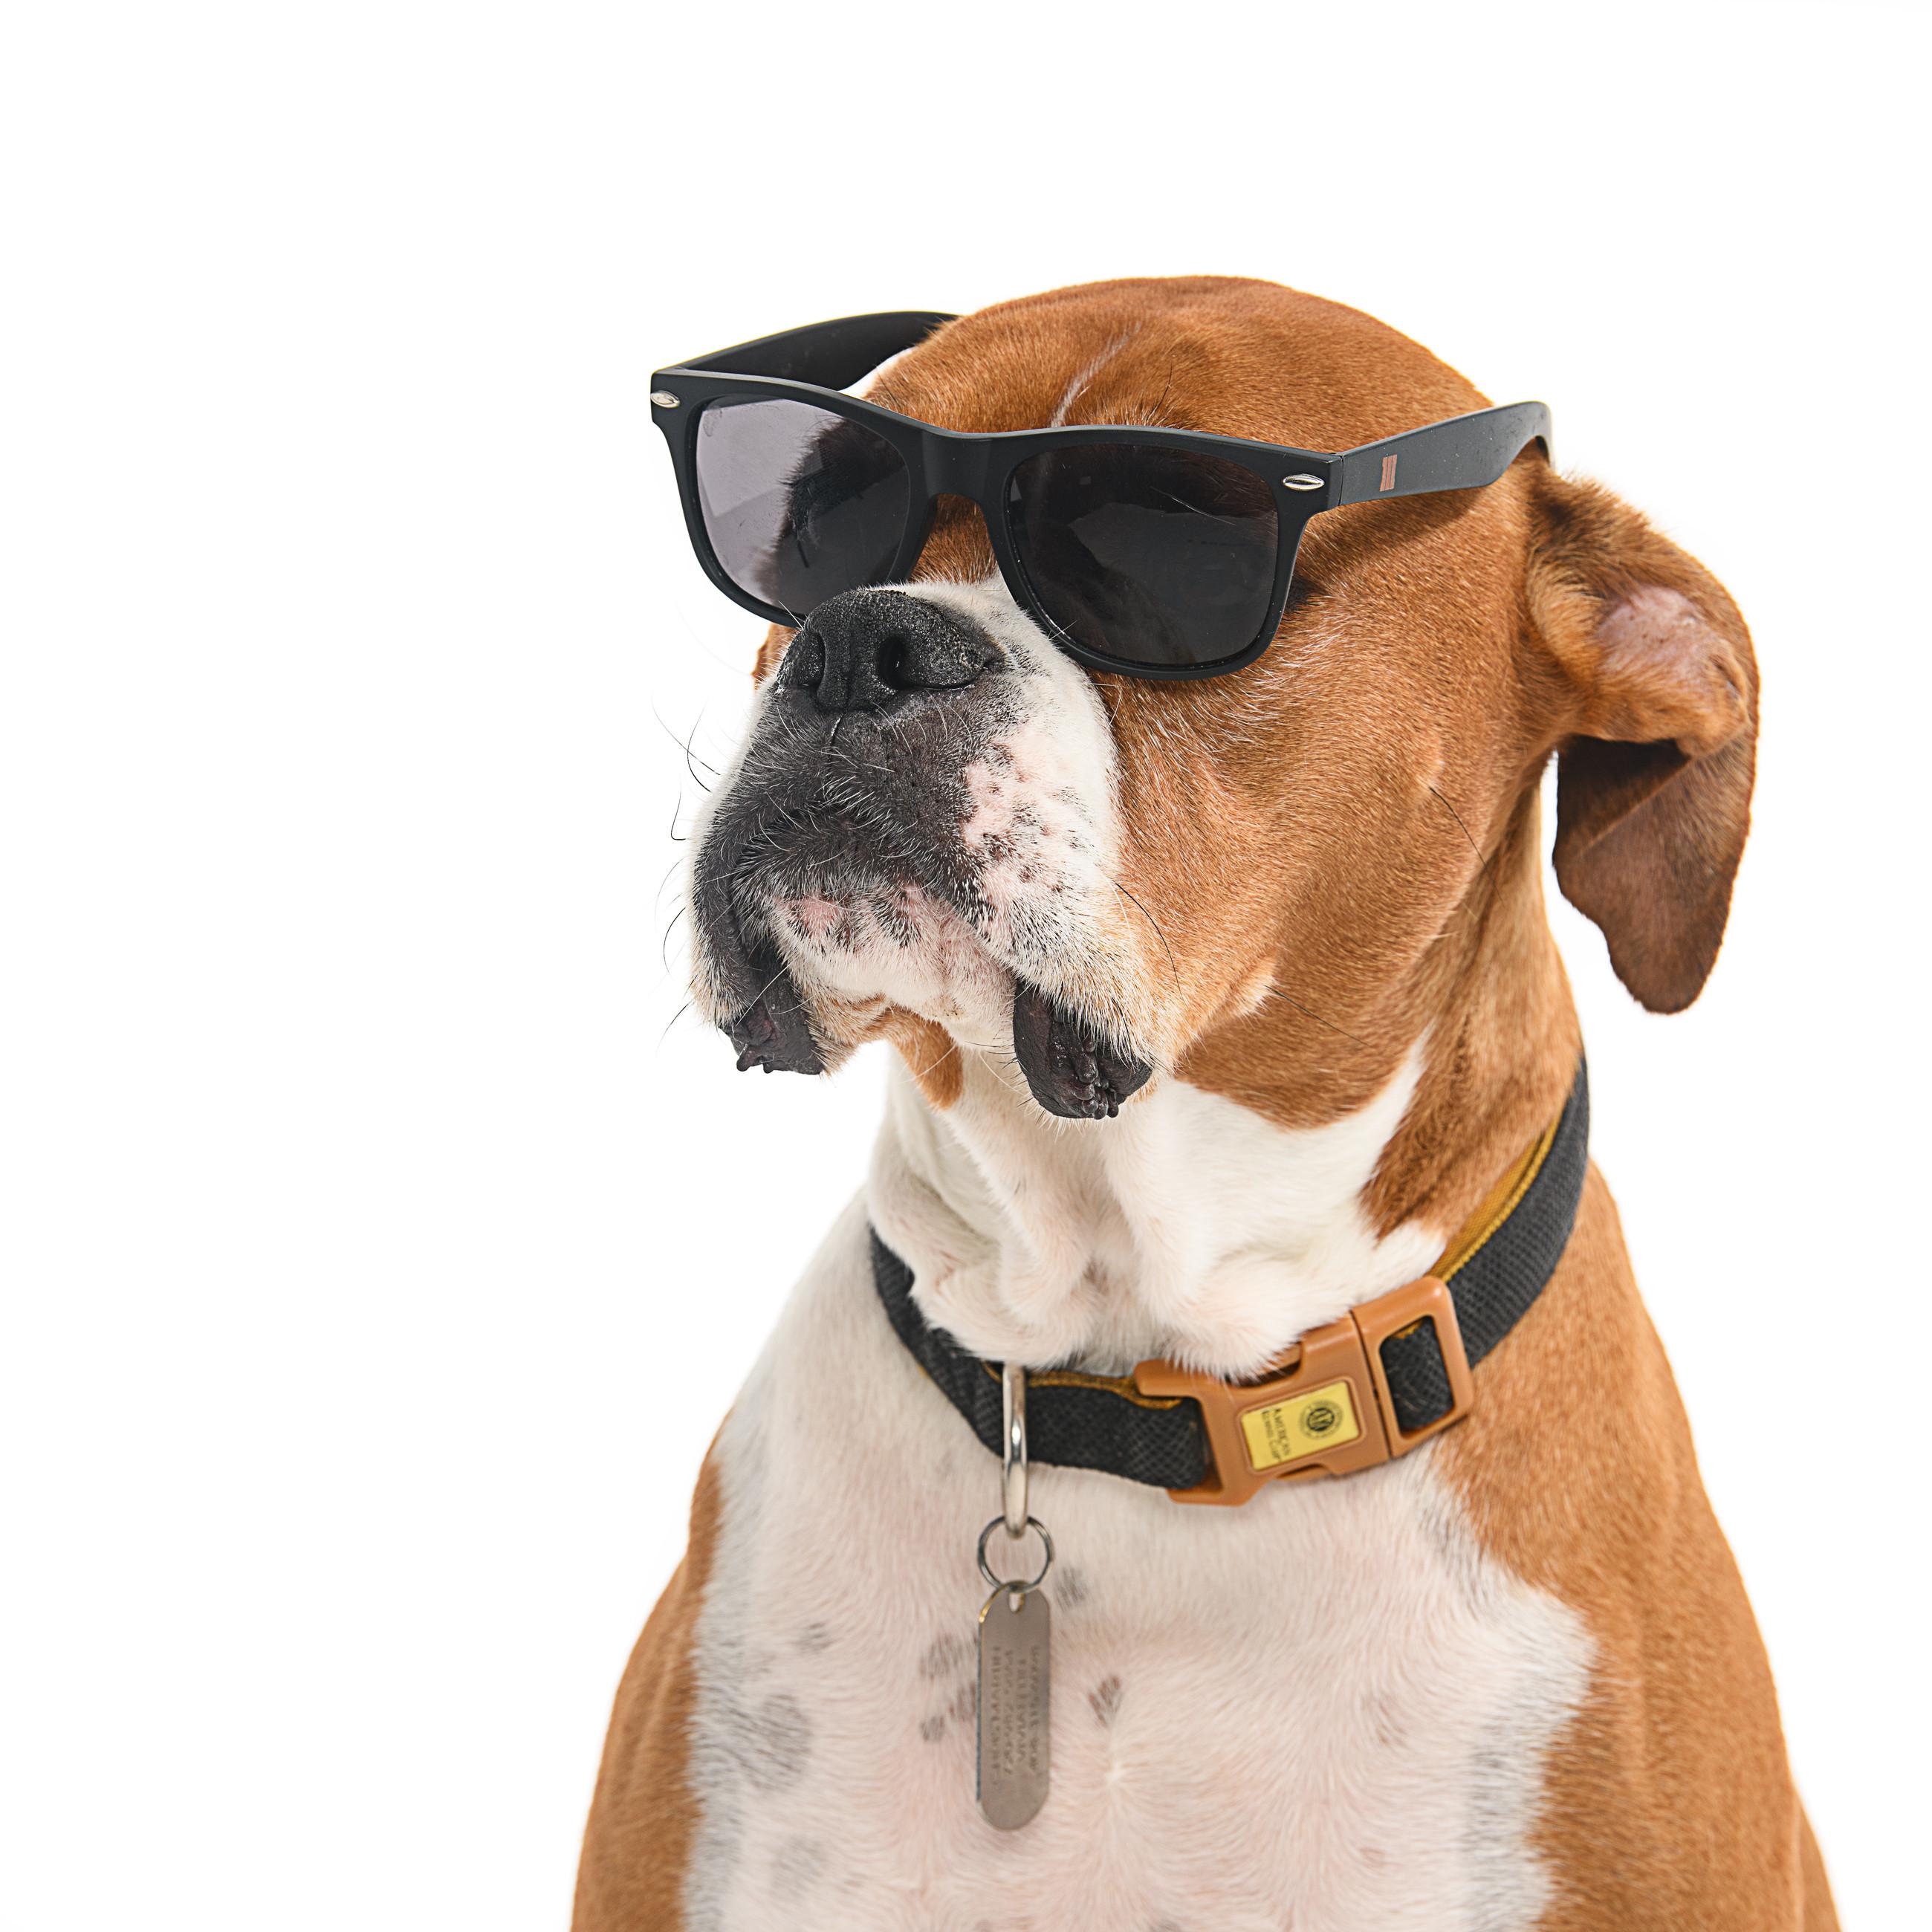 Doggo Portraits